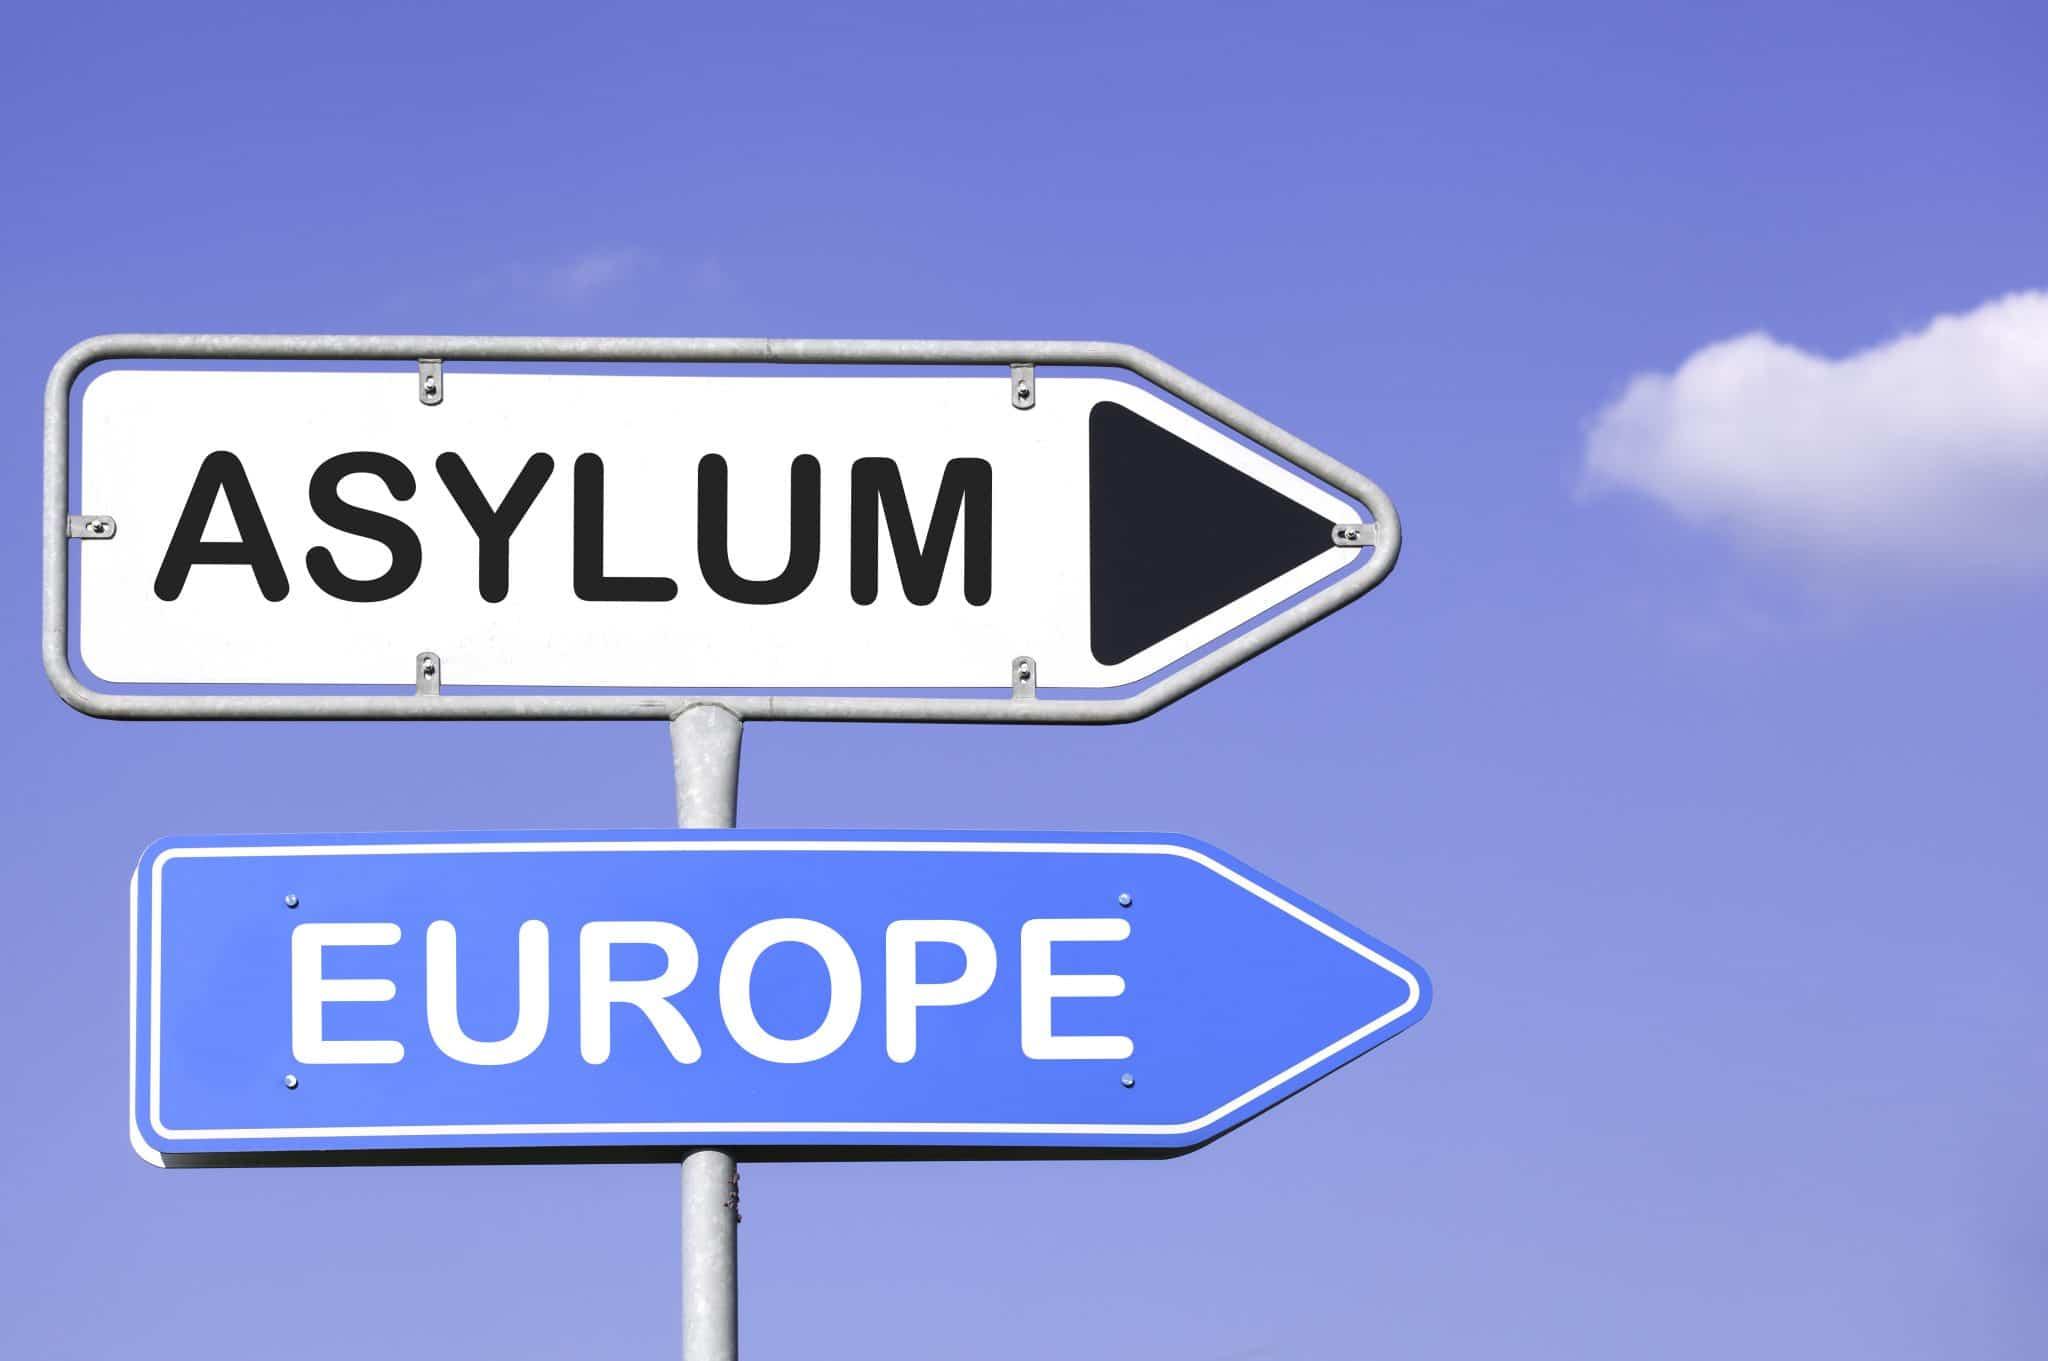 Europe as an Asylum